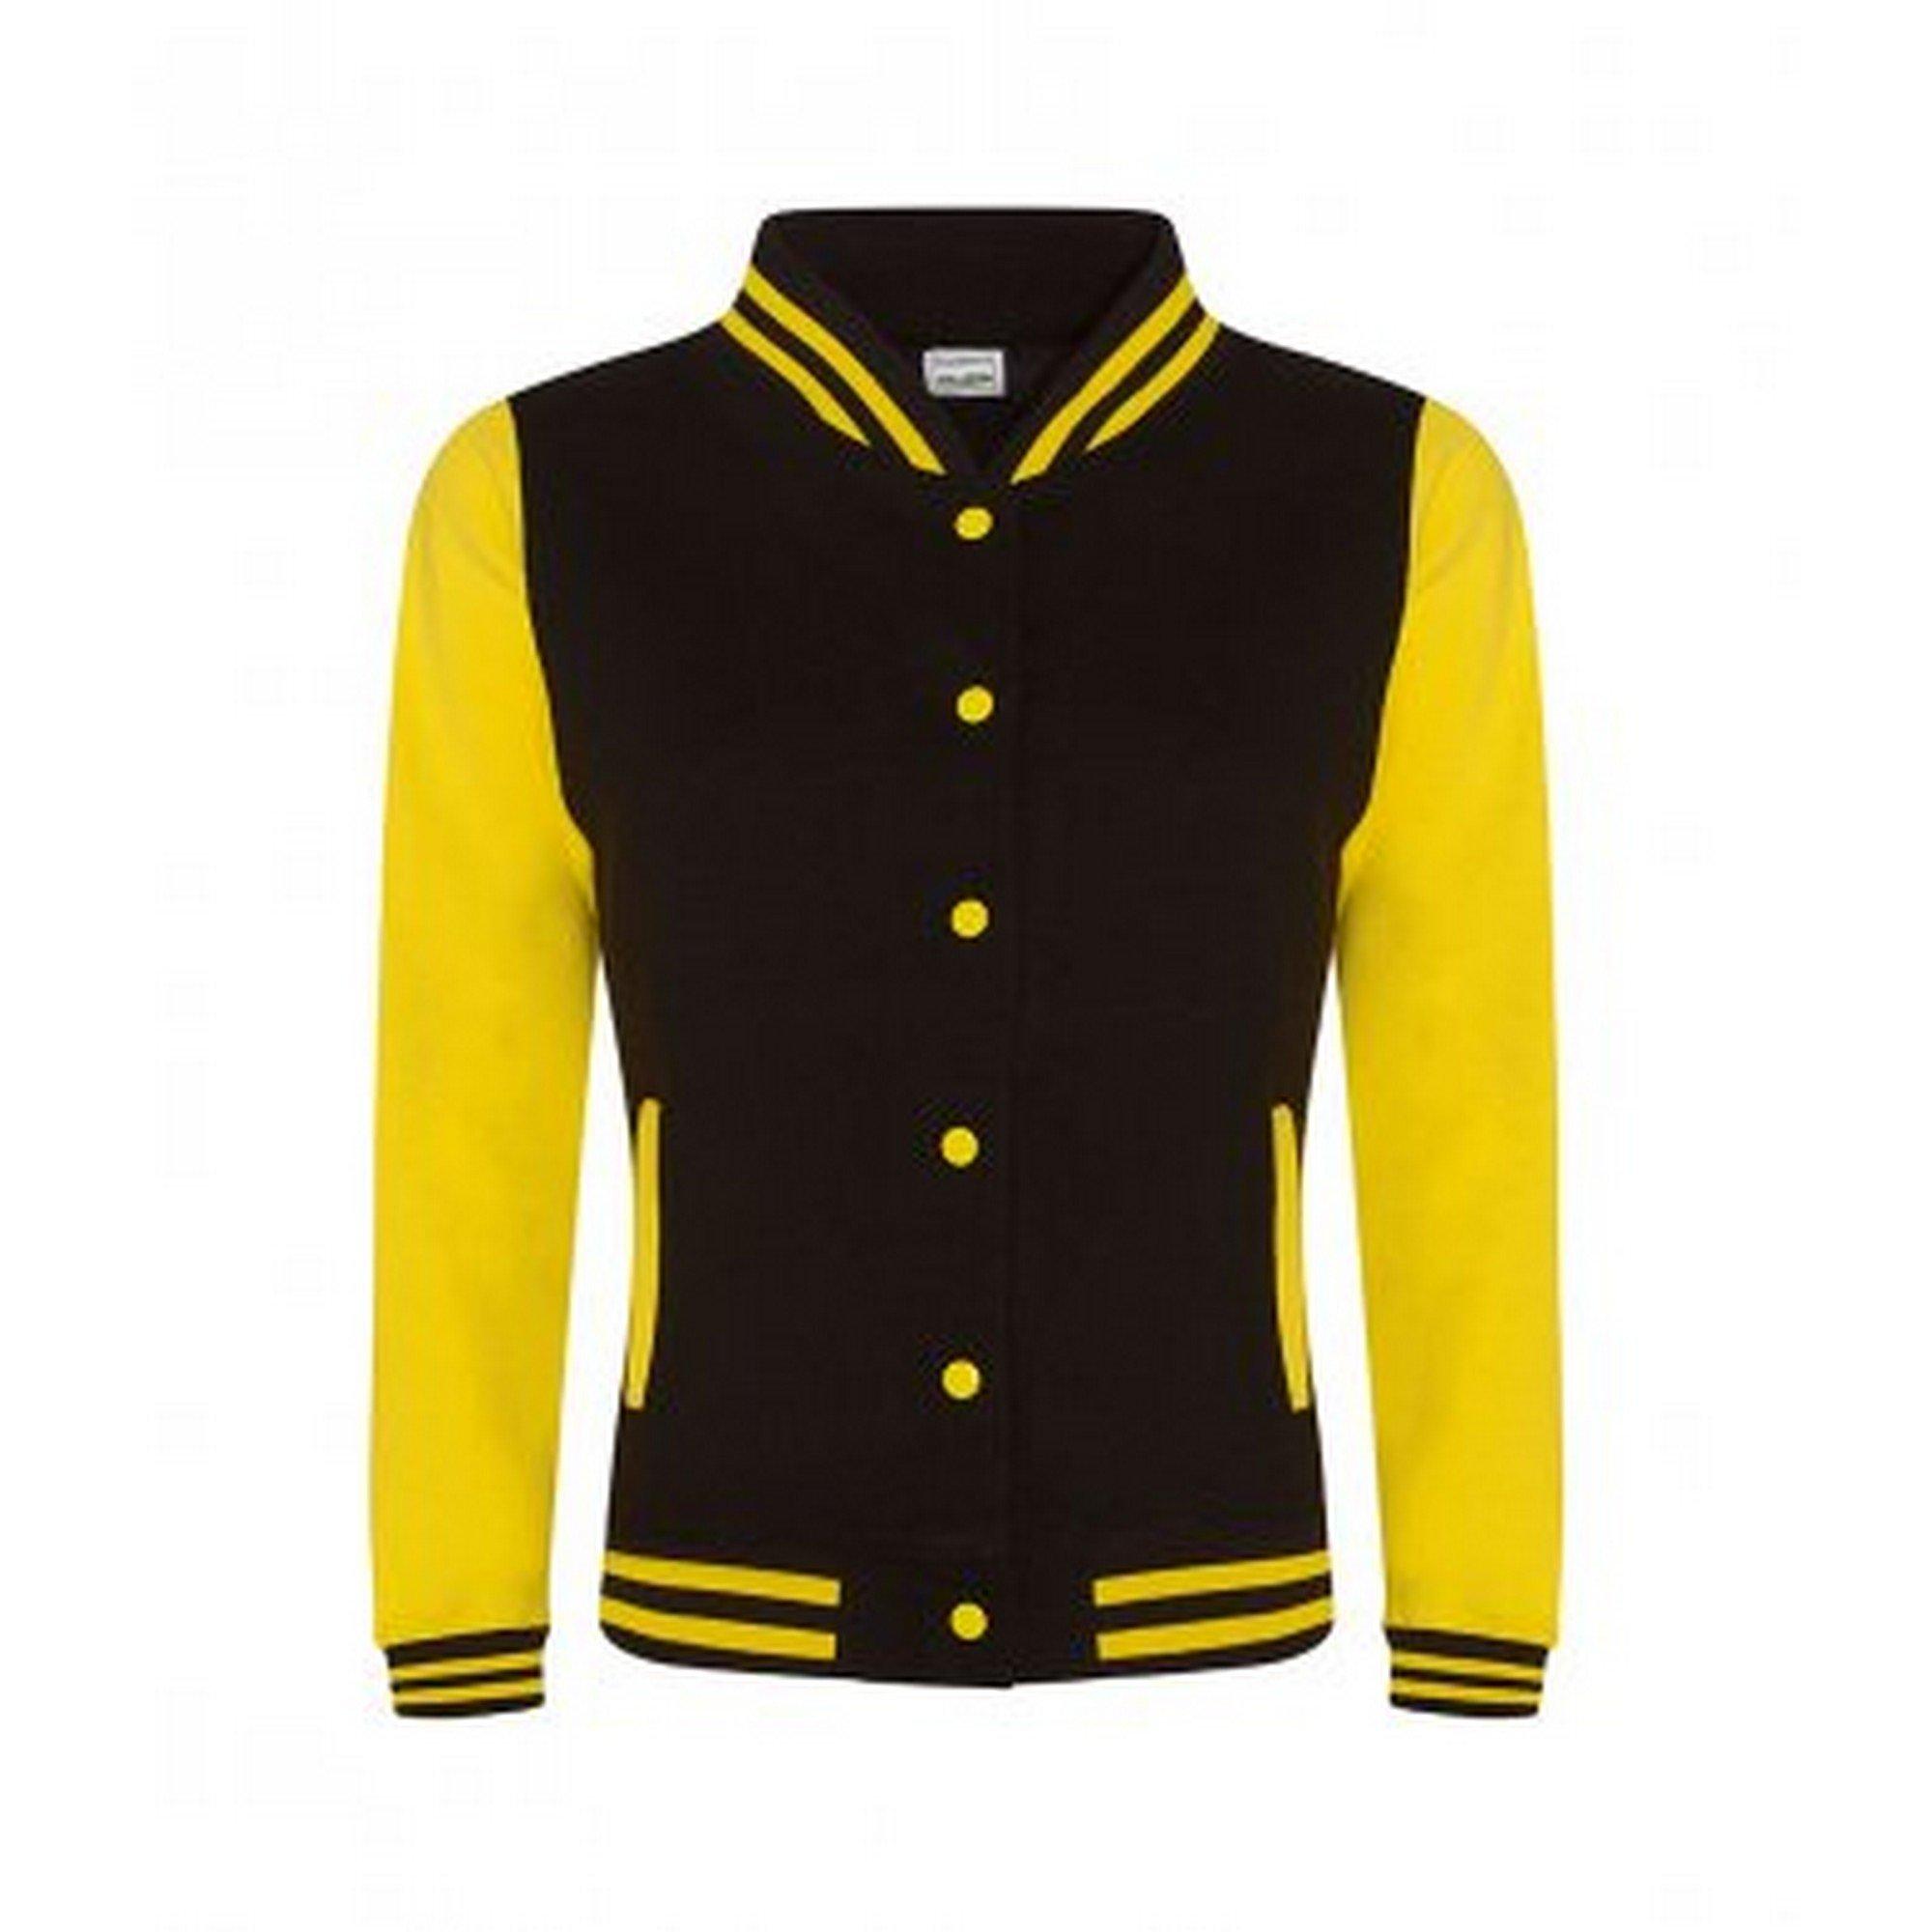 Awdis Womens/Ladies Girlie Varsity Jacket (Extra Large) (Jet Black/Sun Yellow)